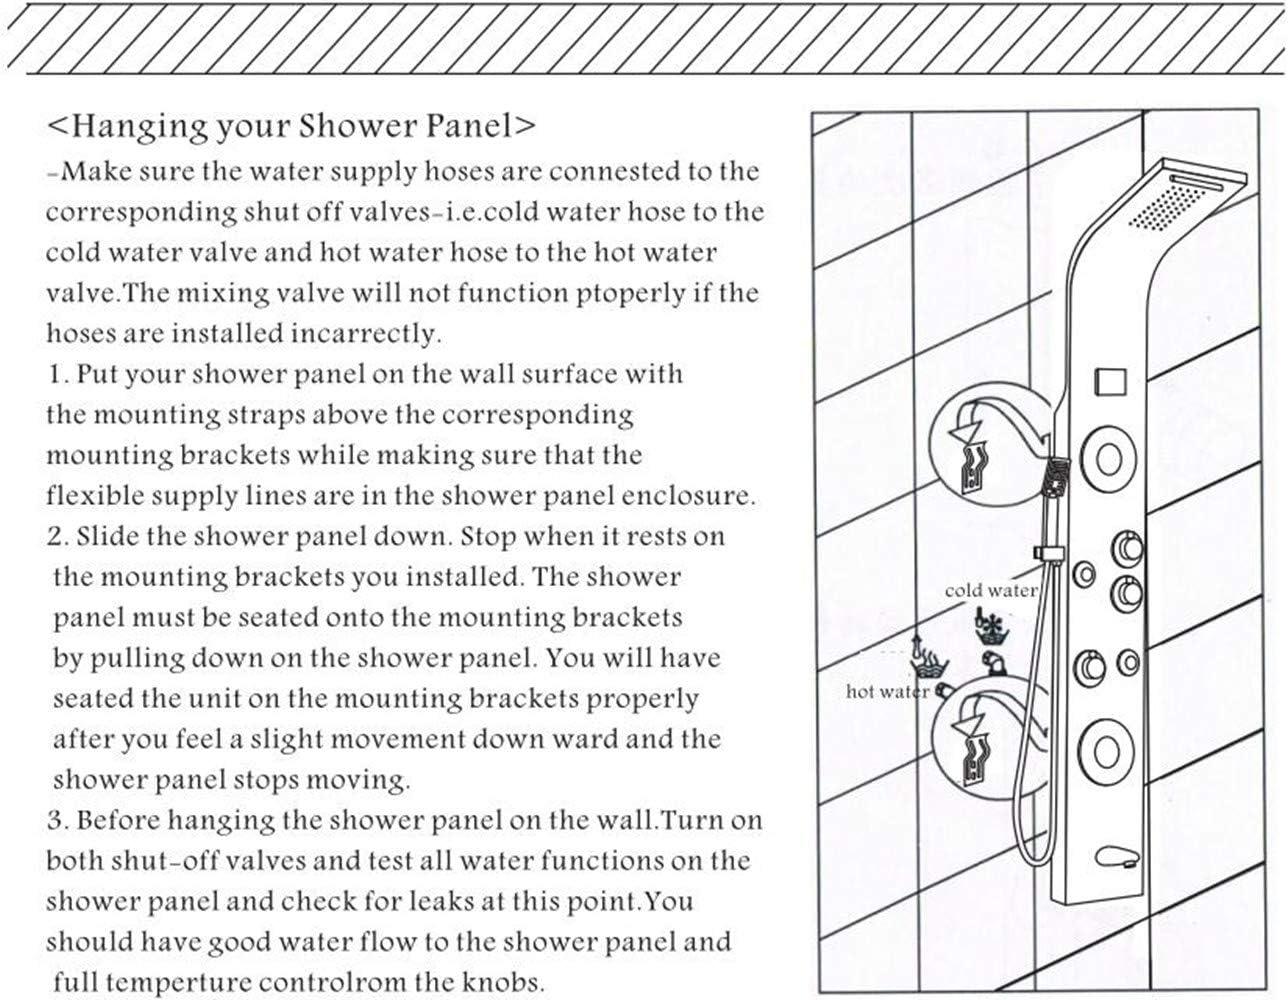 Brushed Nickel Shower Panel Tower Rain/&Waterfall Massage Body System Tap